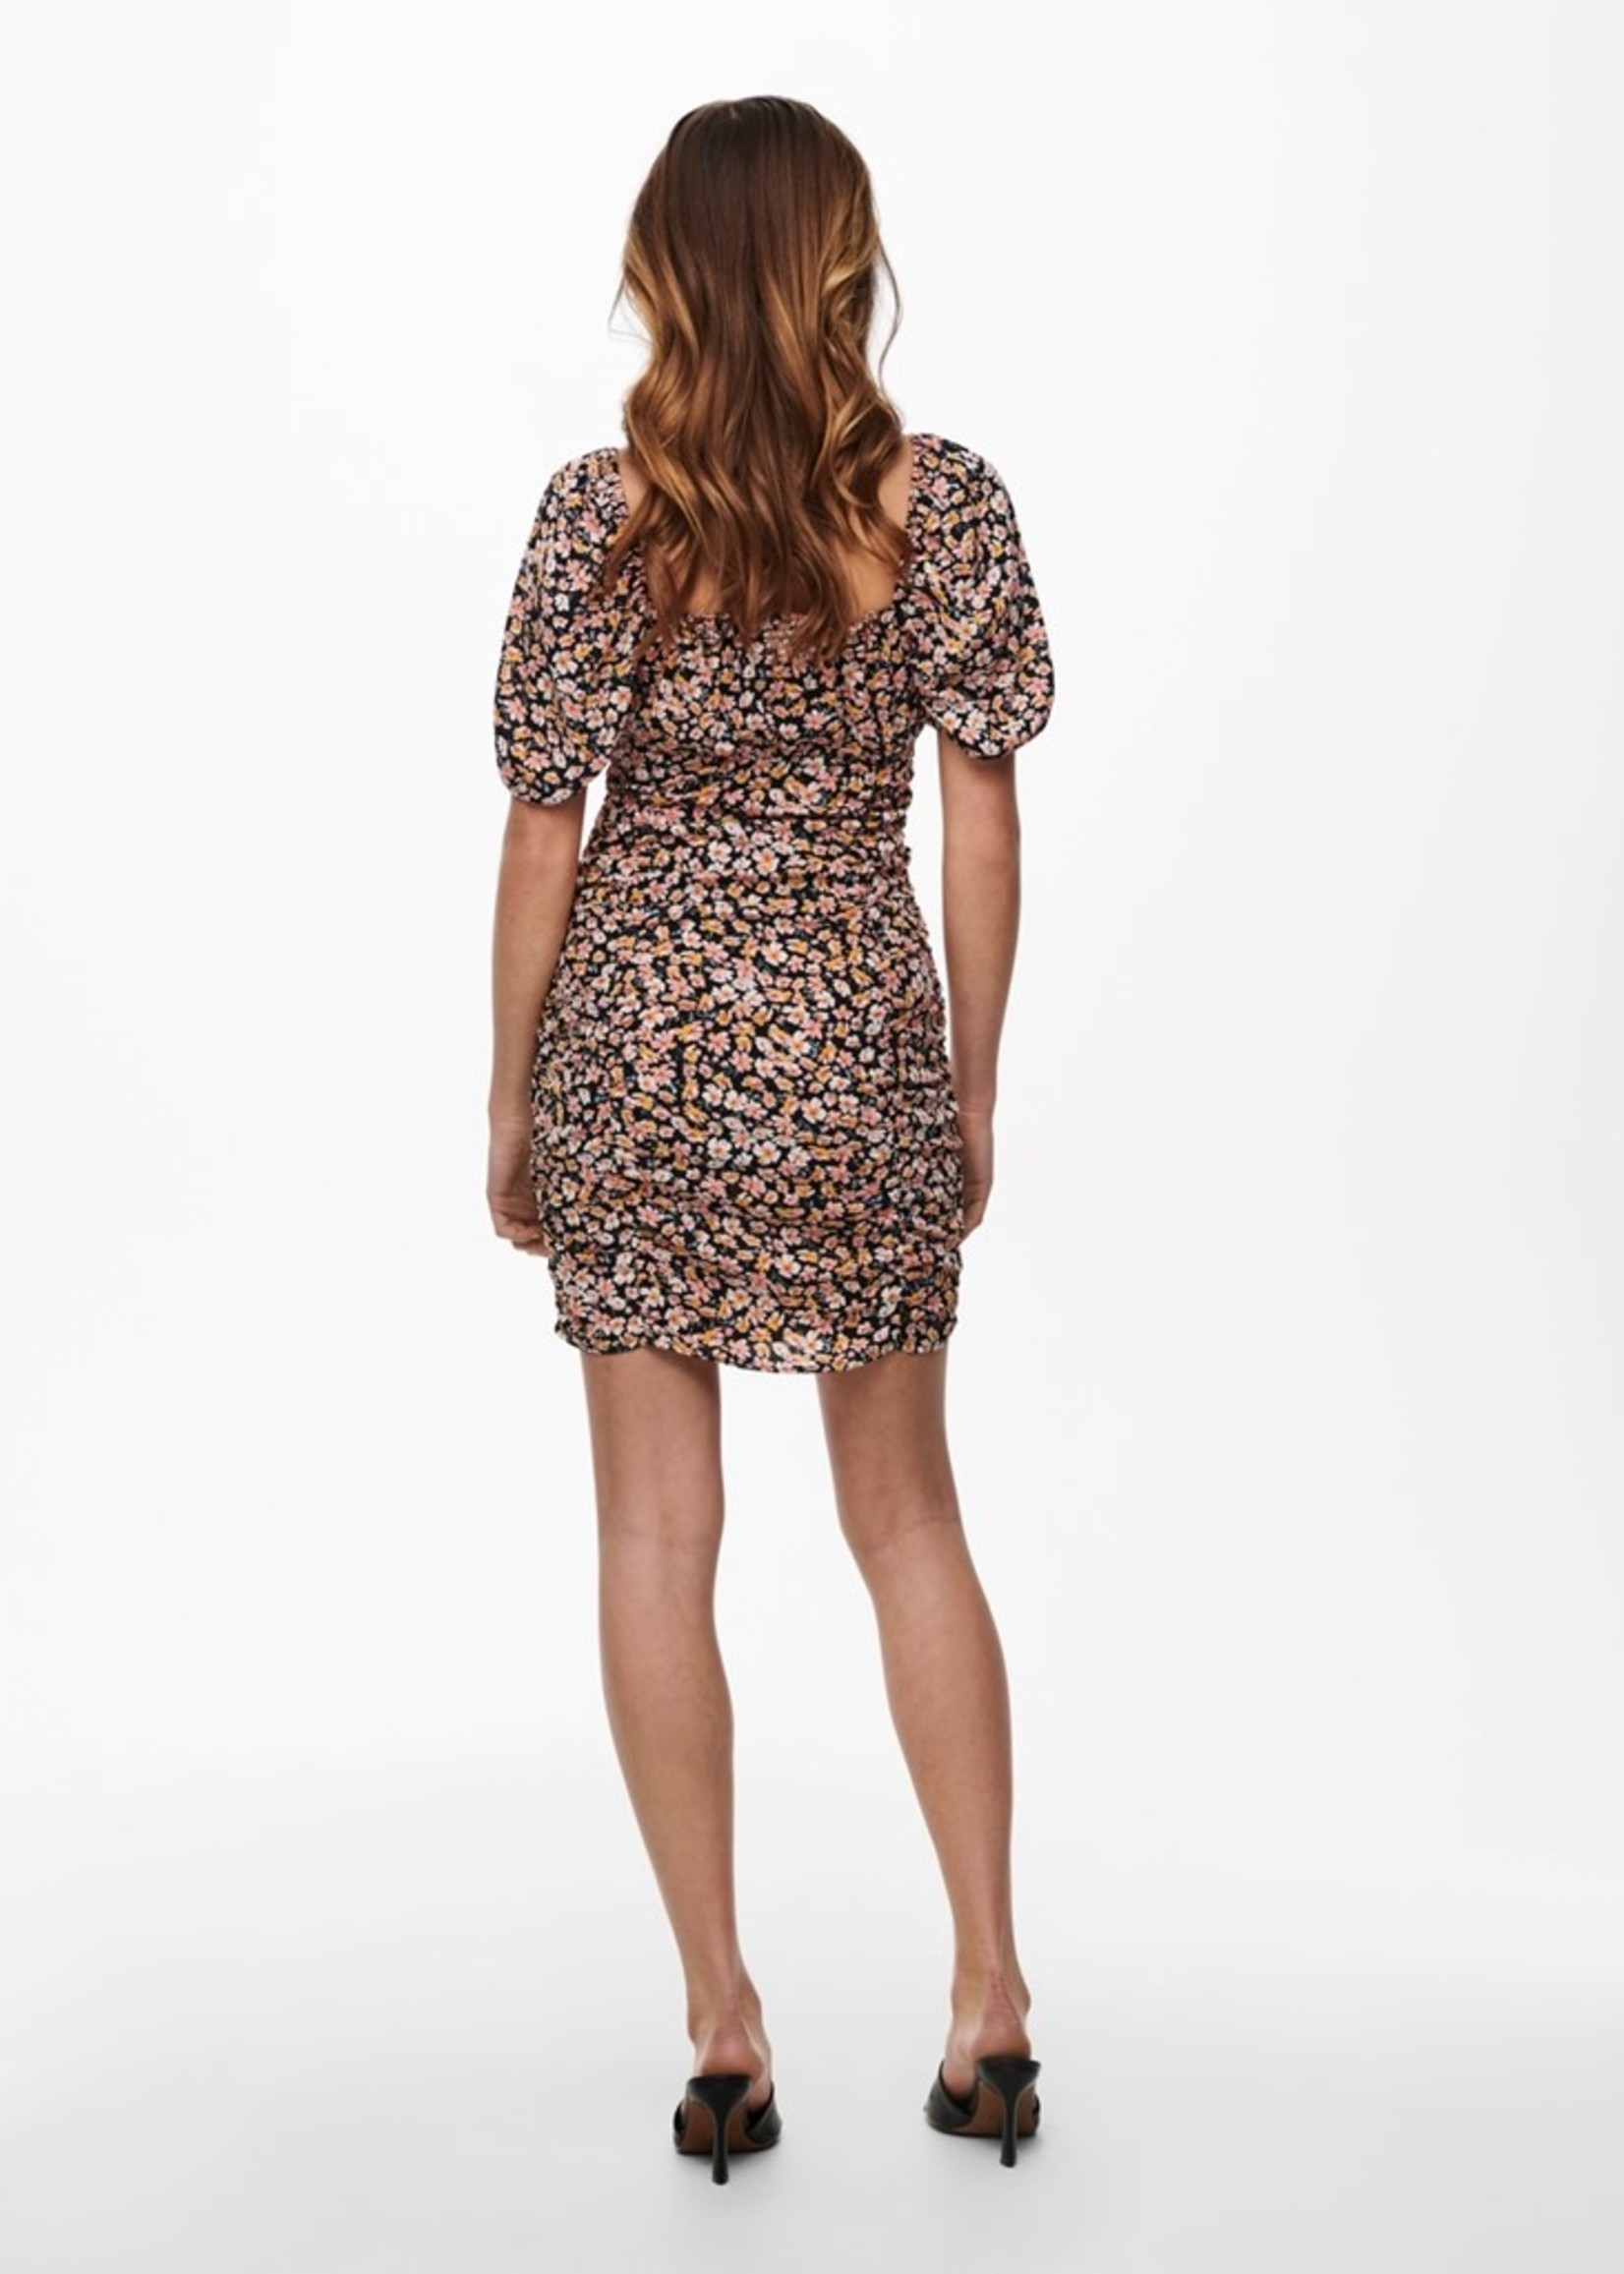 Vero Moda ONLY FUCHSIA RUCHED SIDE DRESS